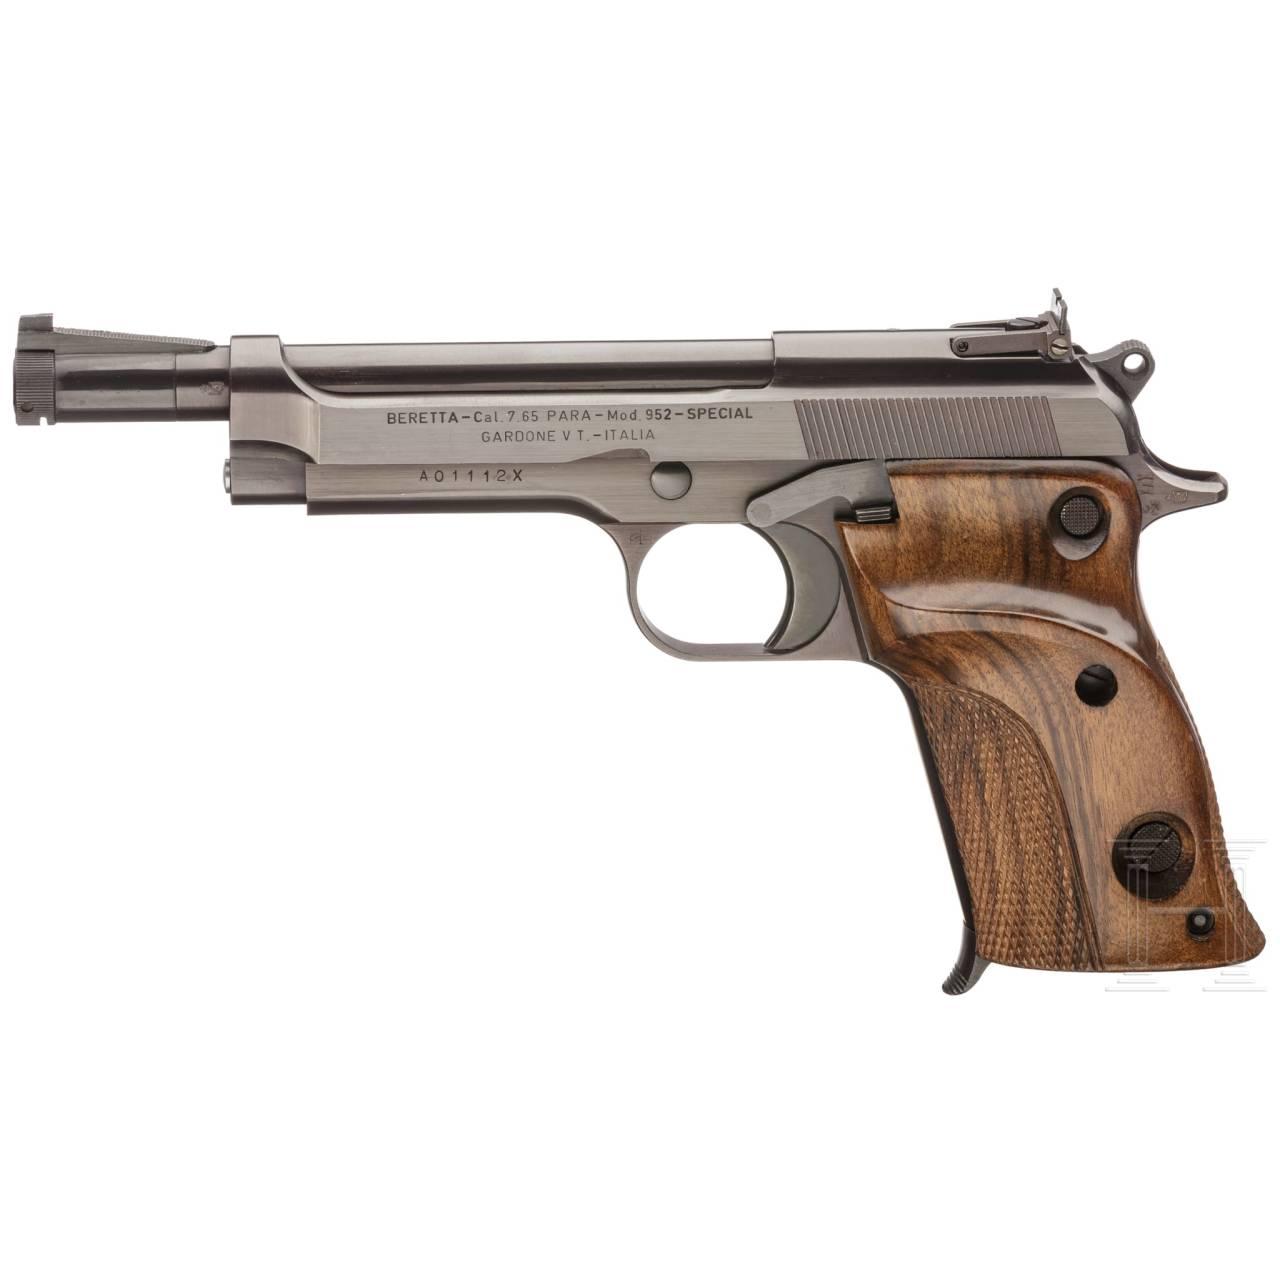 Beretta Mod. 952-Special